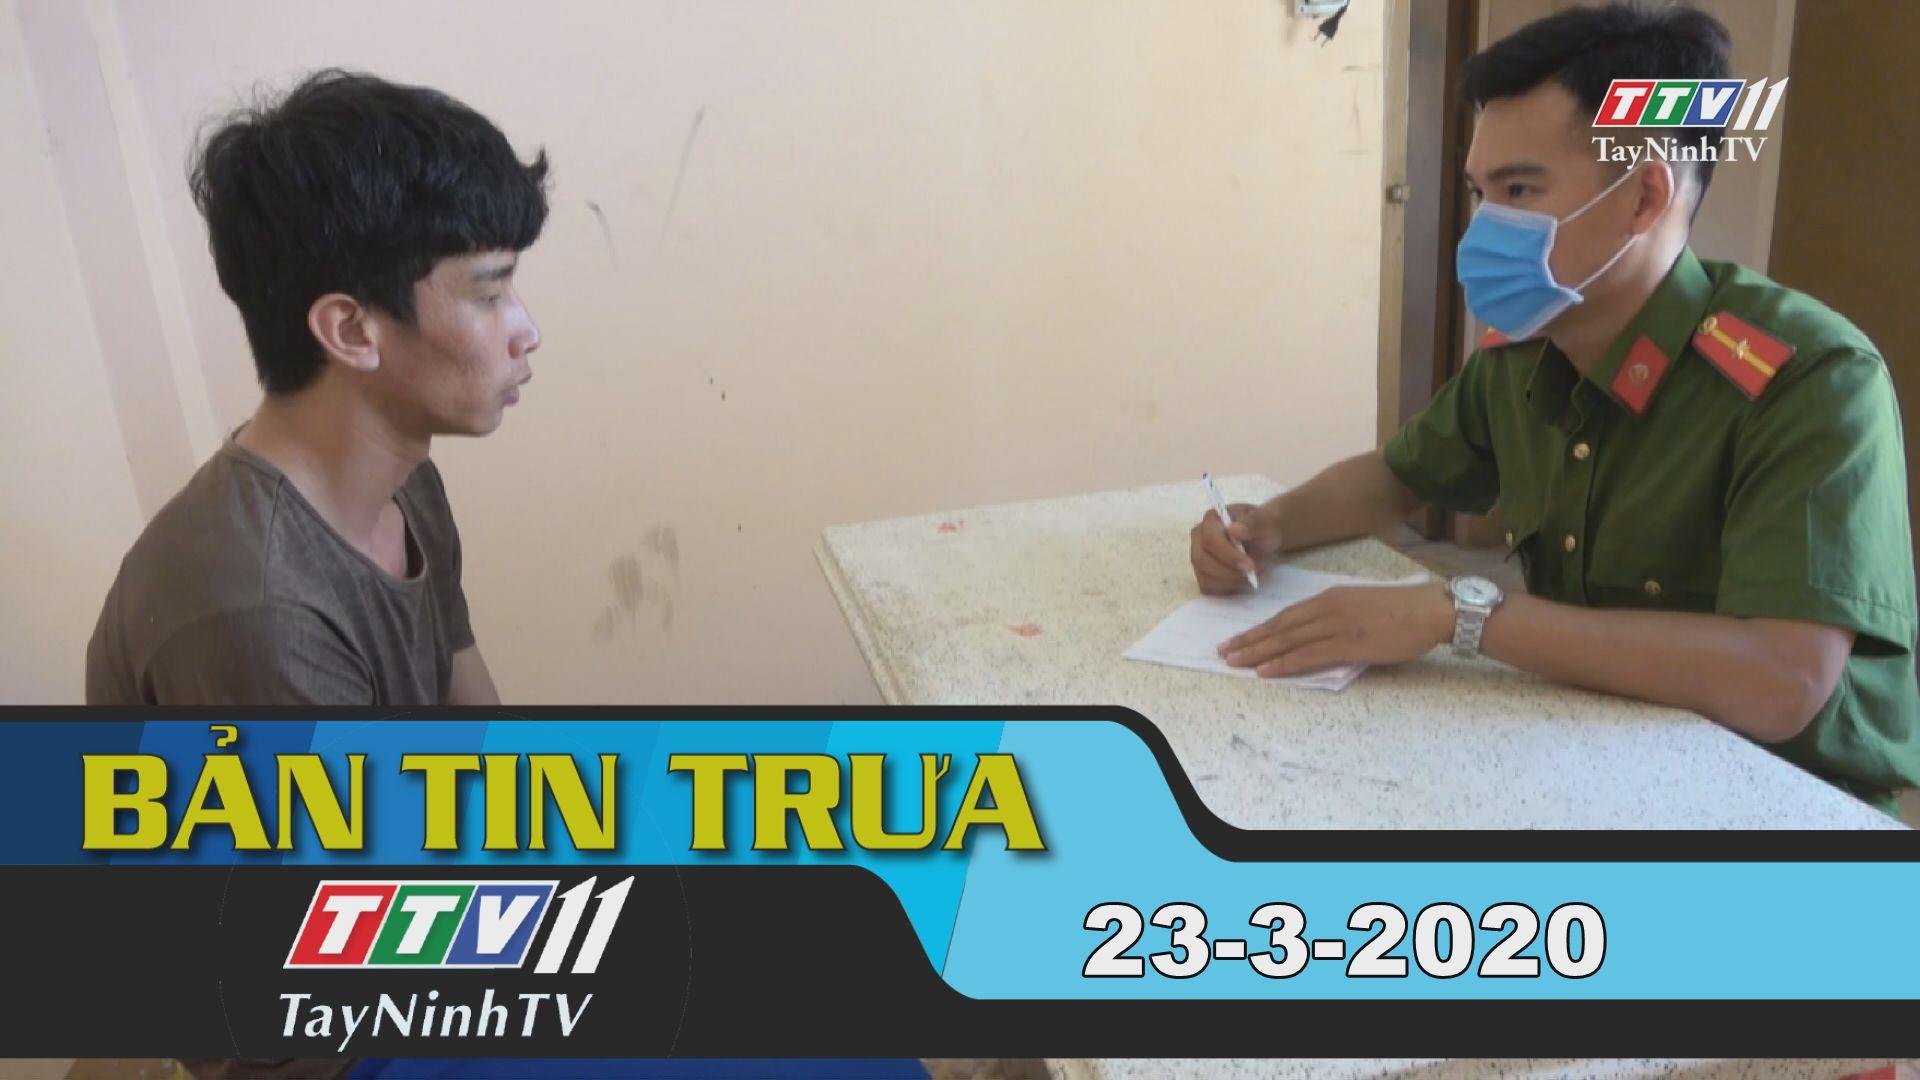 Bản tin trưa 23-3-2020 | Tin tức hôm nay | TayNinhTV